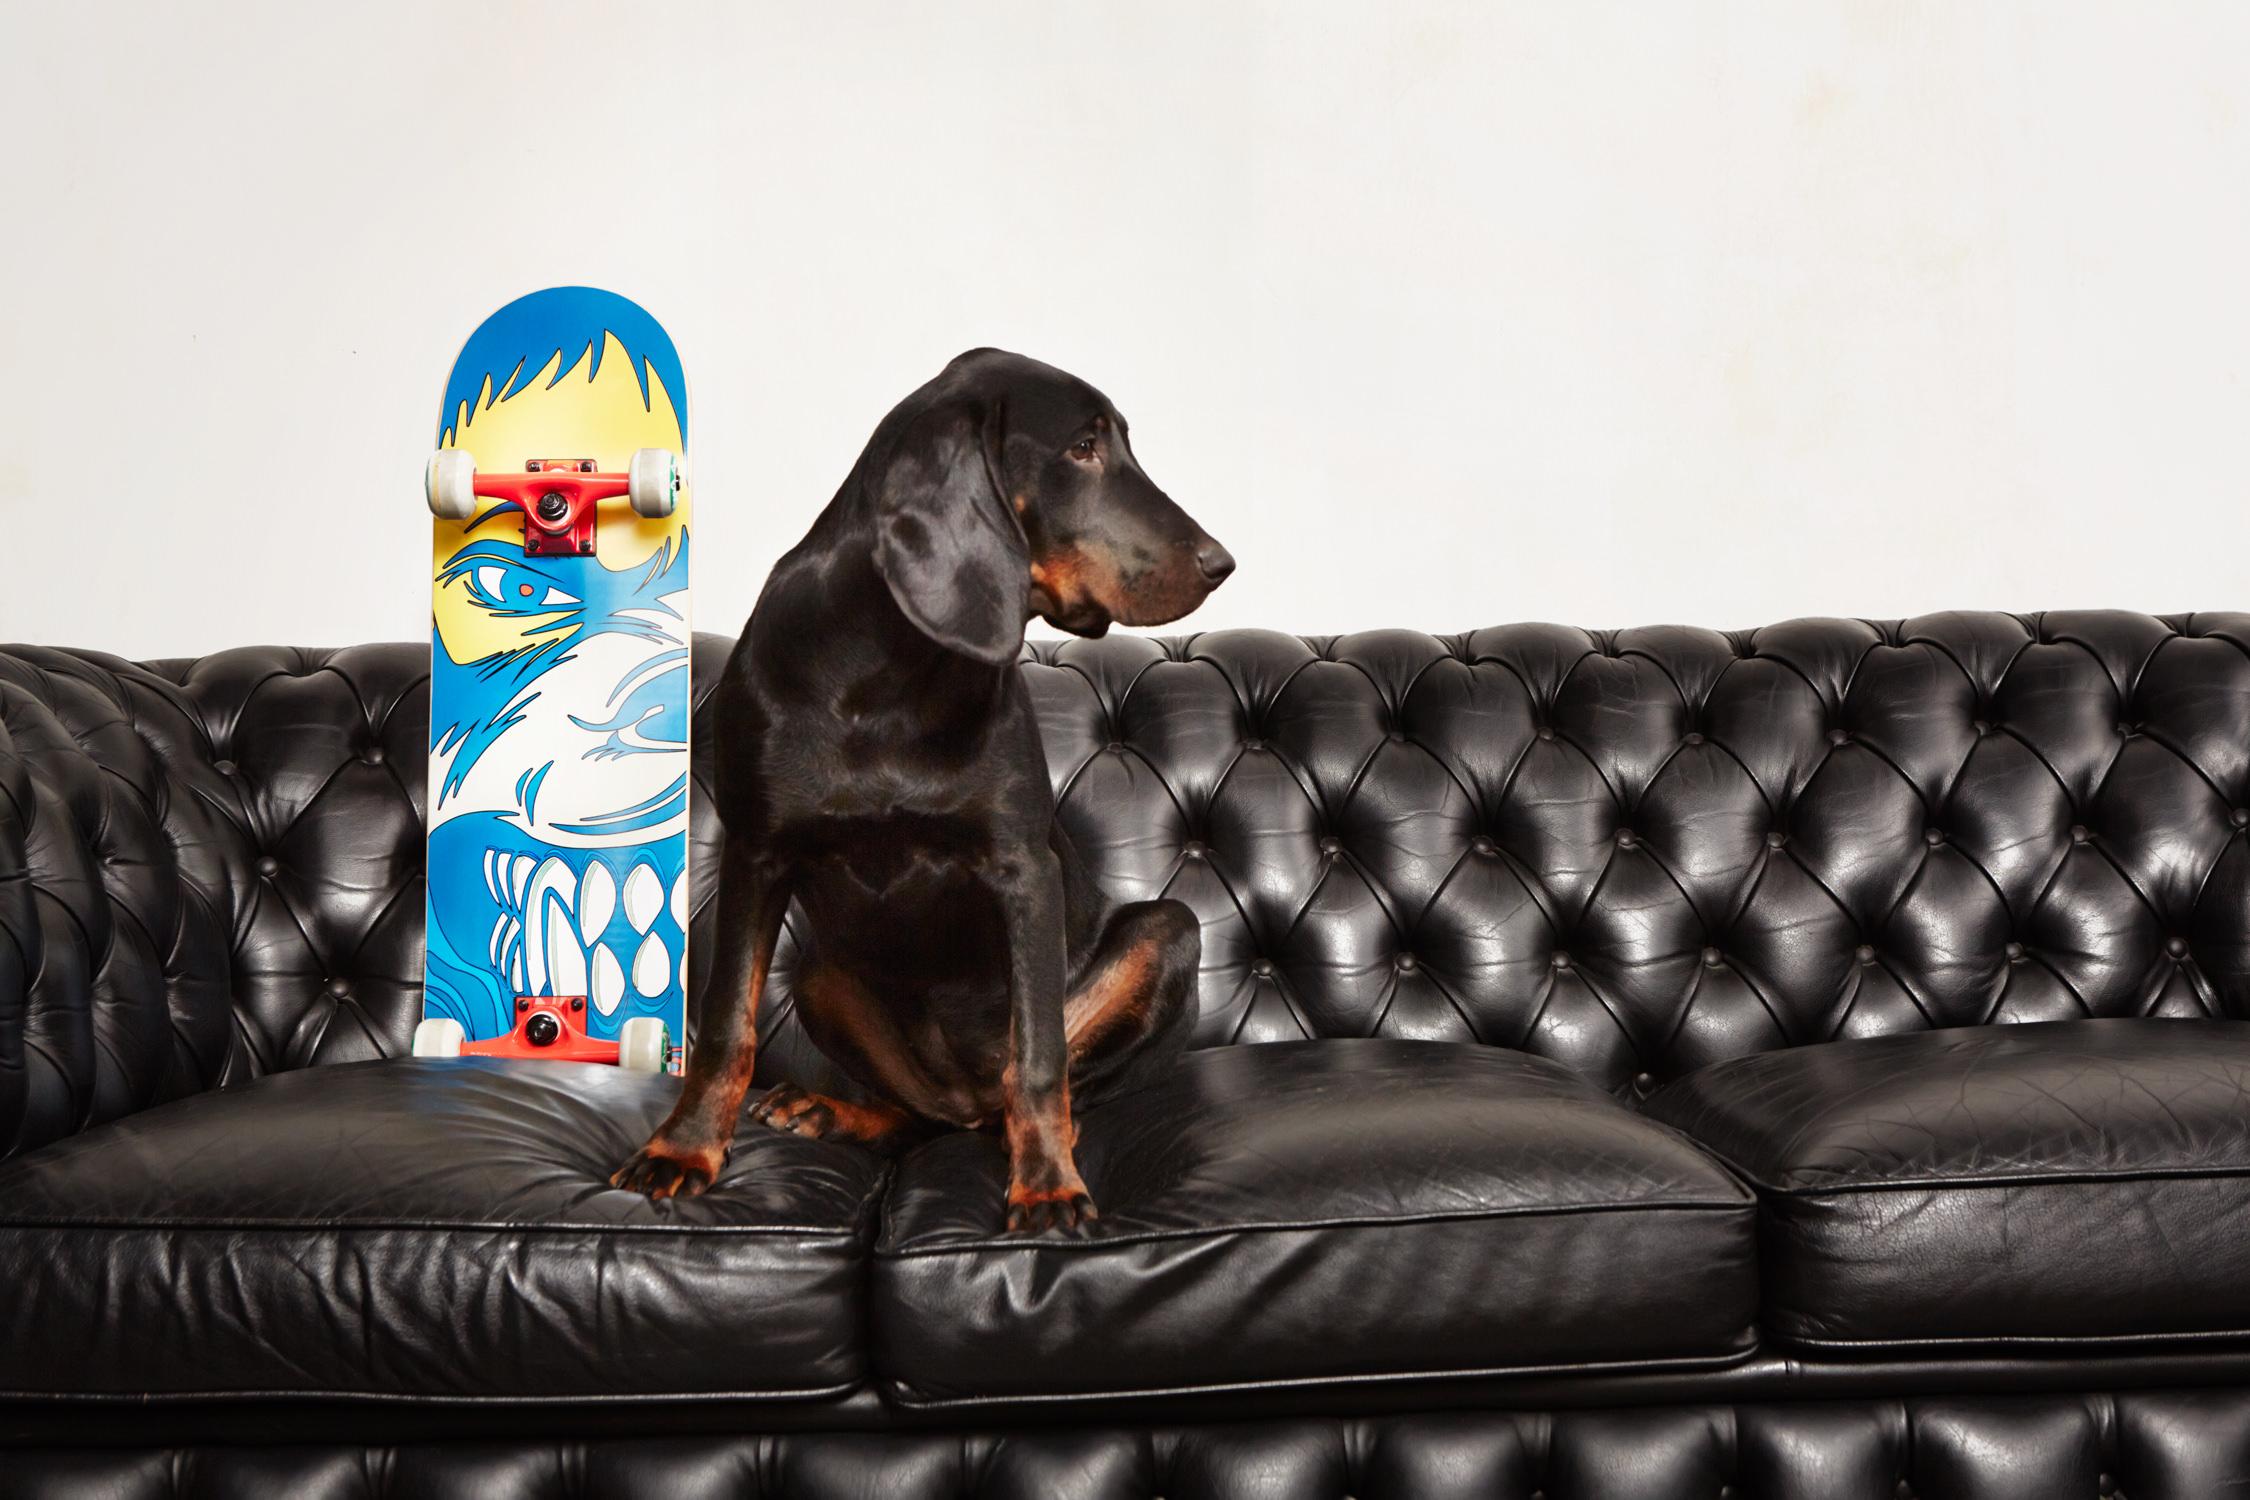 area fun4u sports hund sofa bunt ledersofa leder skatebaords Jörn Strojny